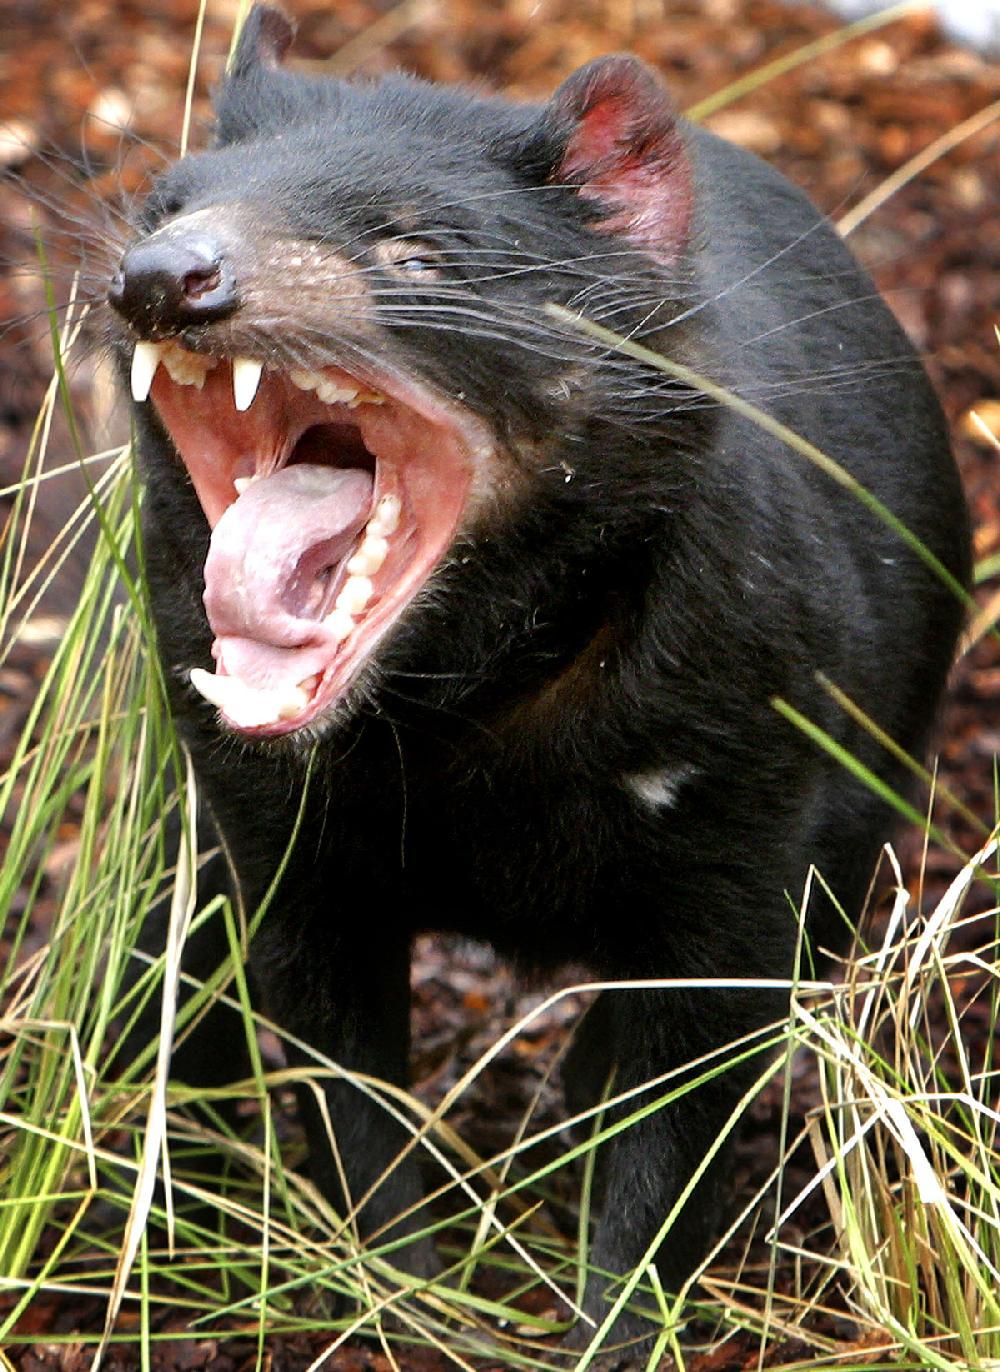 jacksonville to debut tasmanian devil mascot jacksonville to debut tasmanian devil